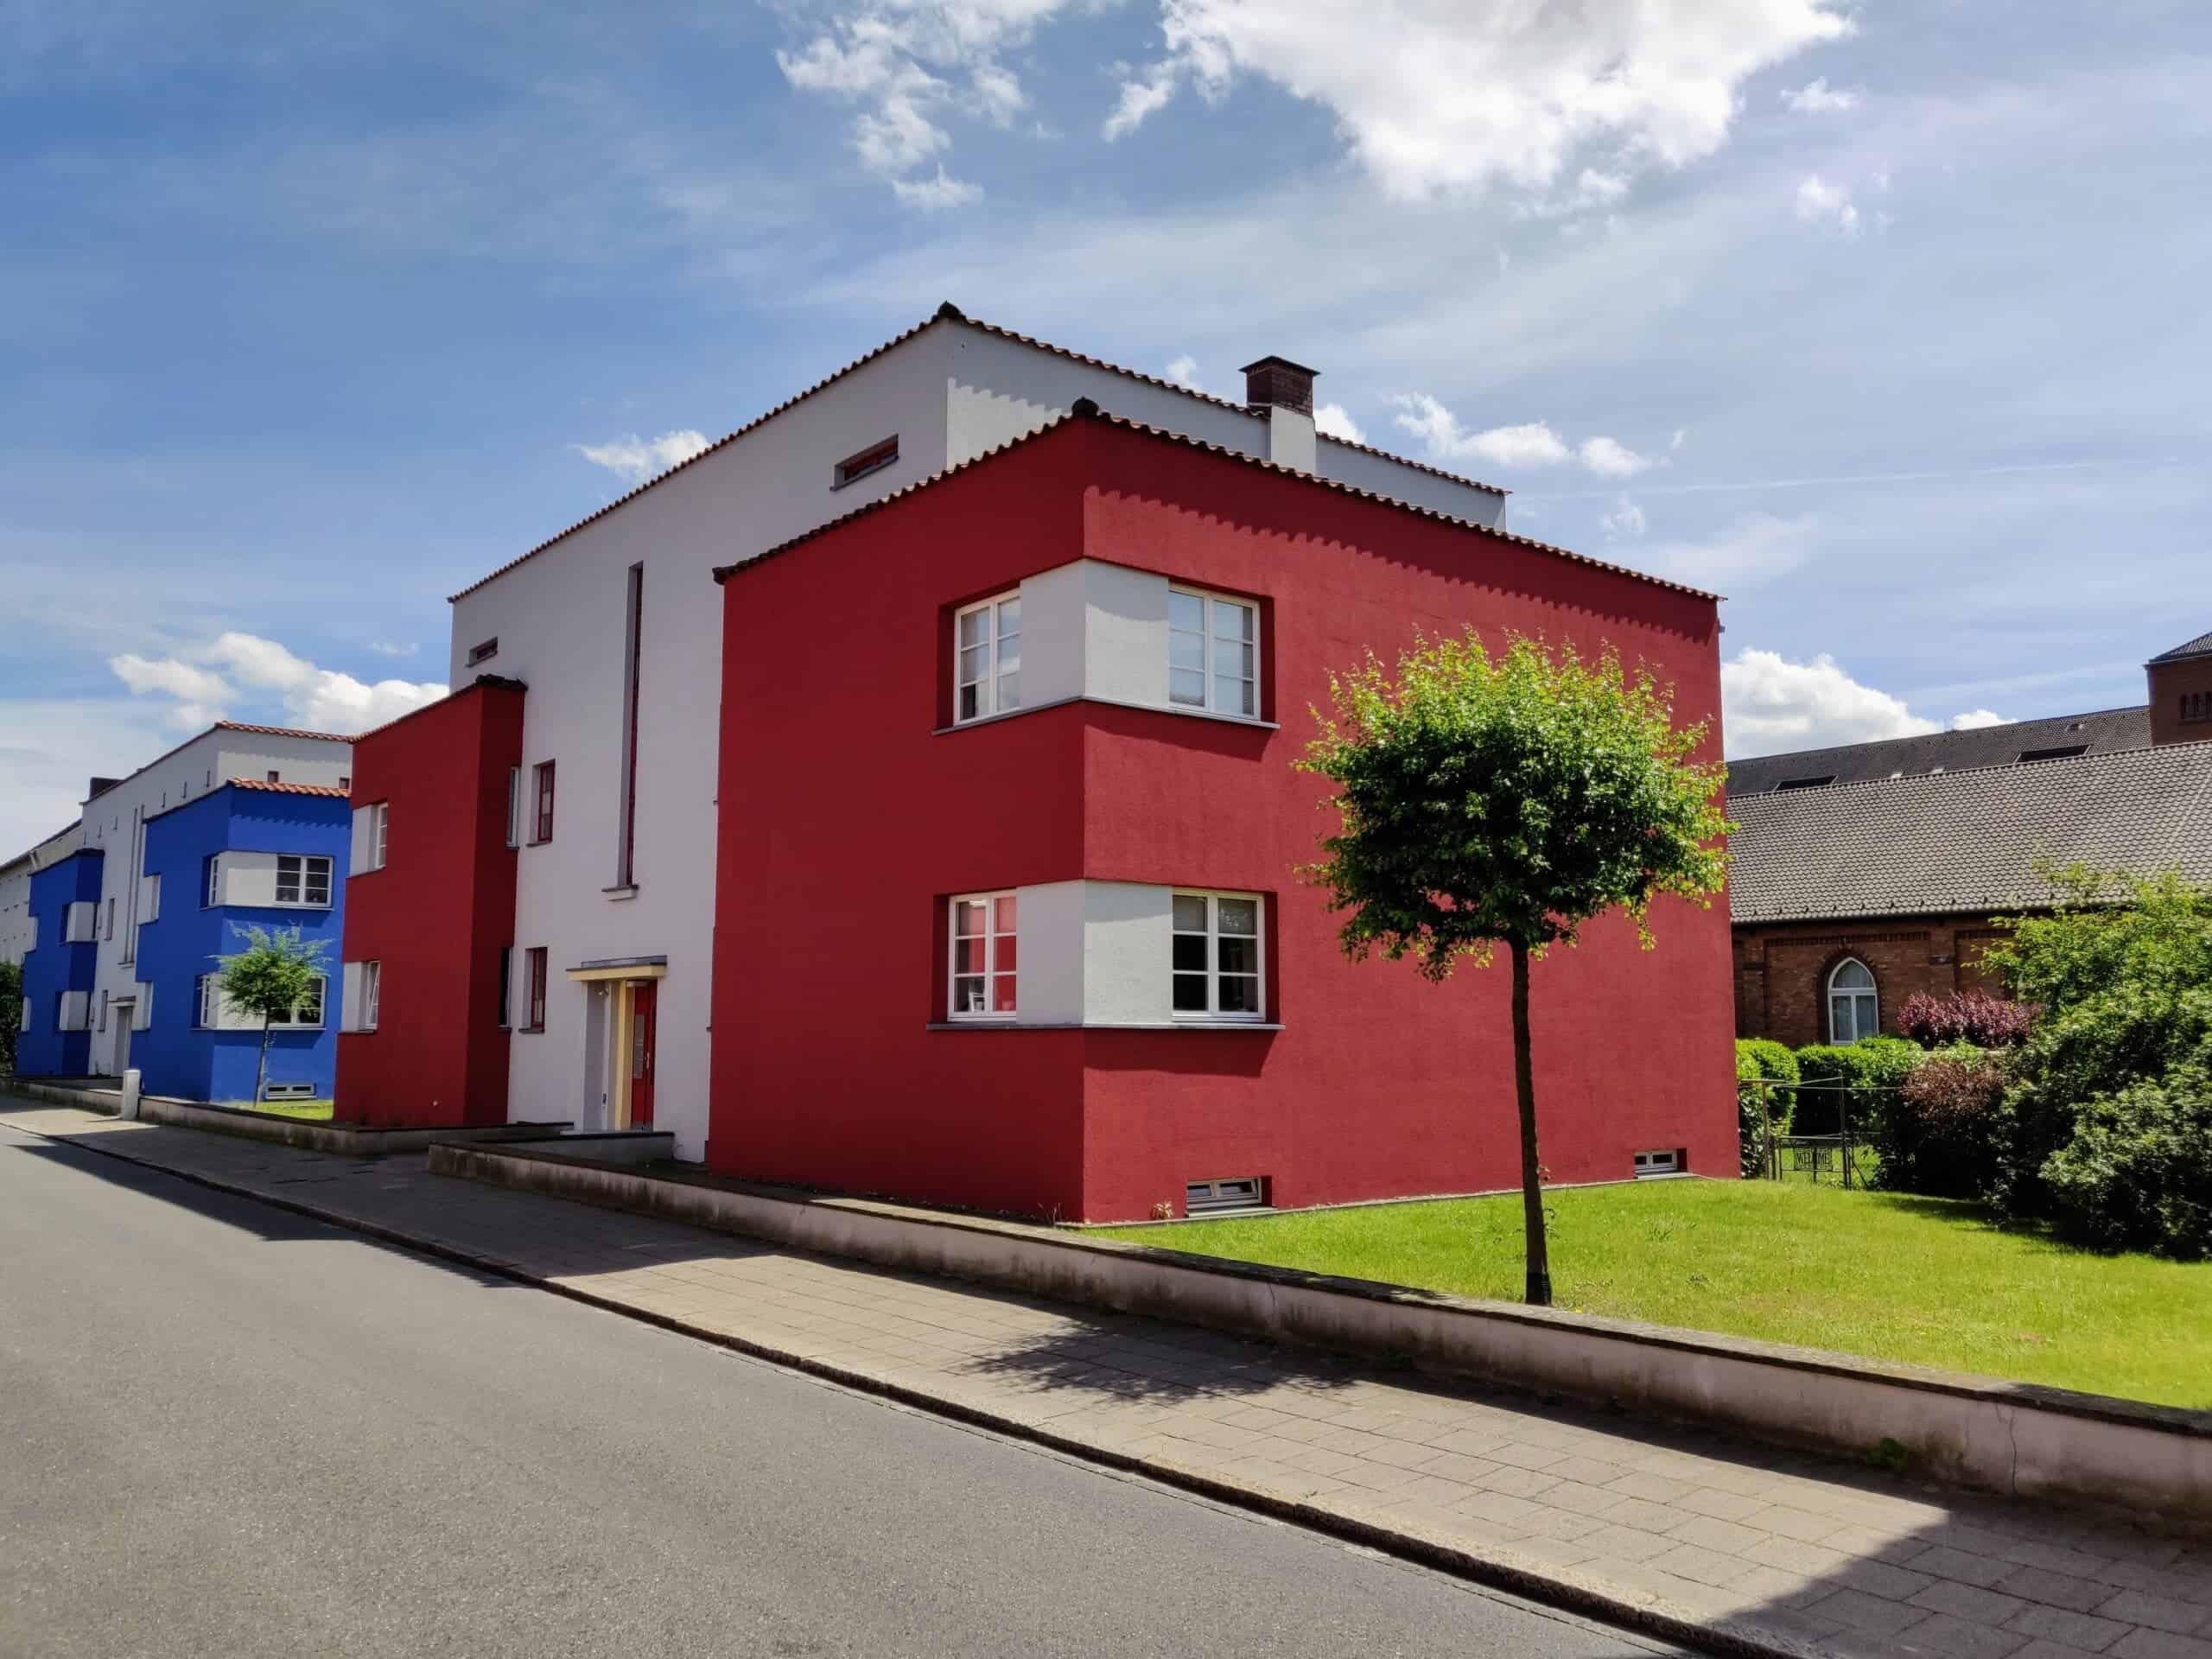 Bauhaus in Celle